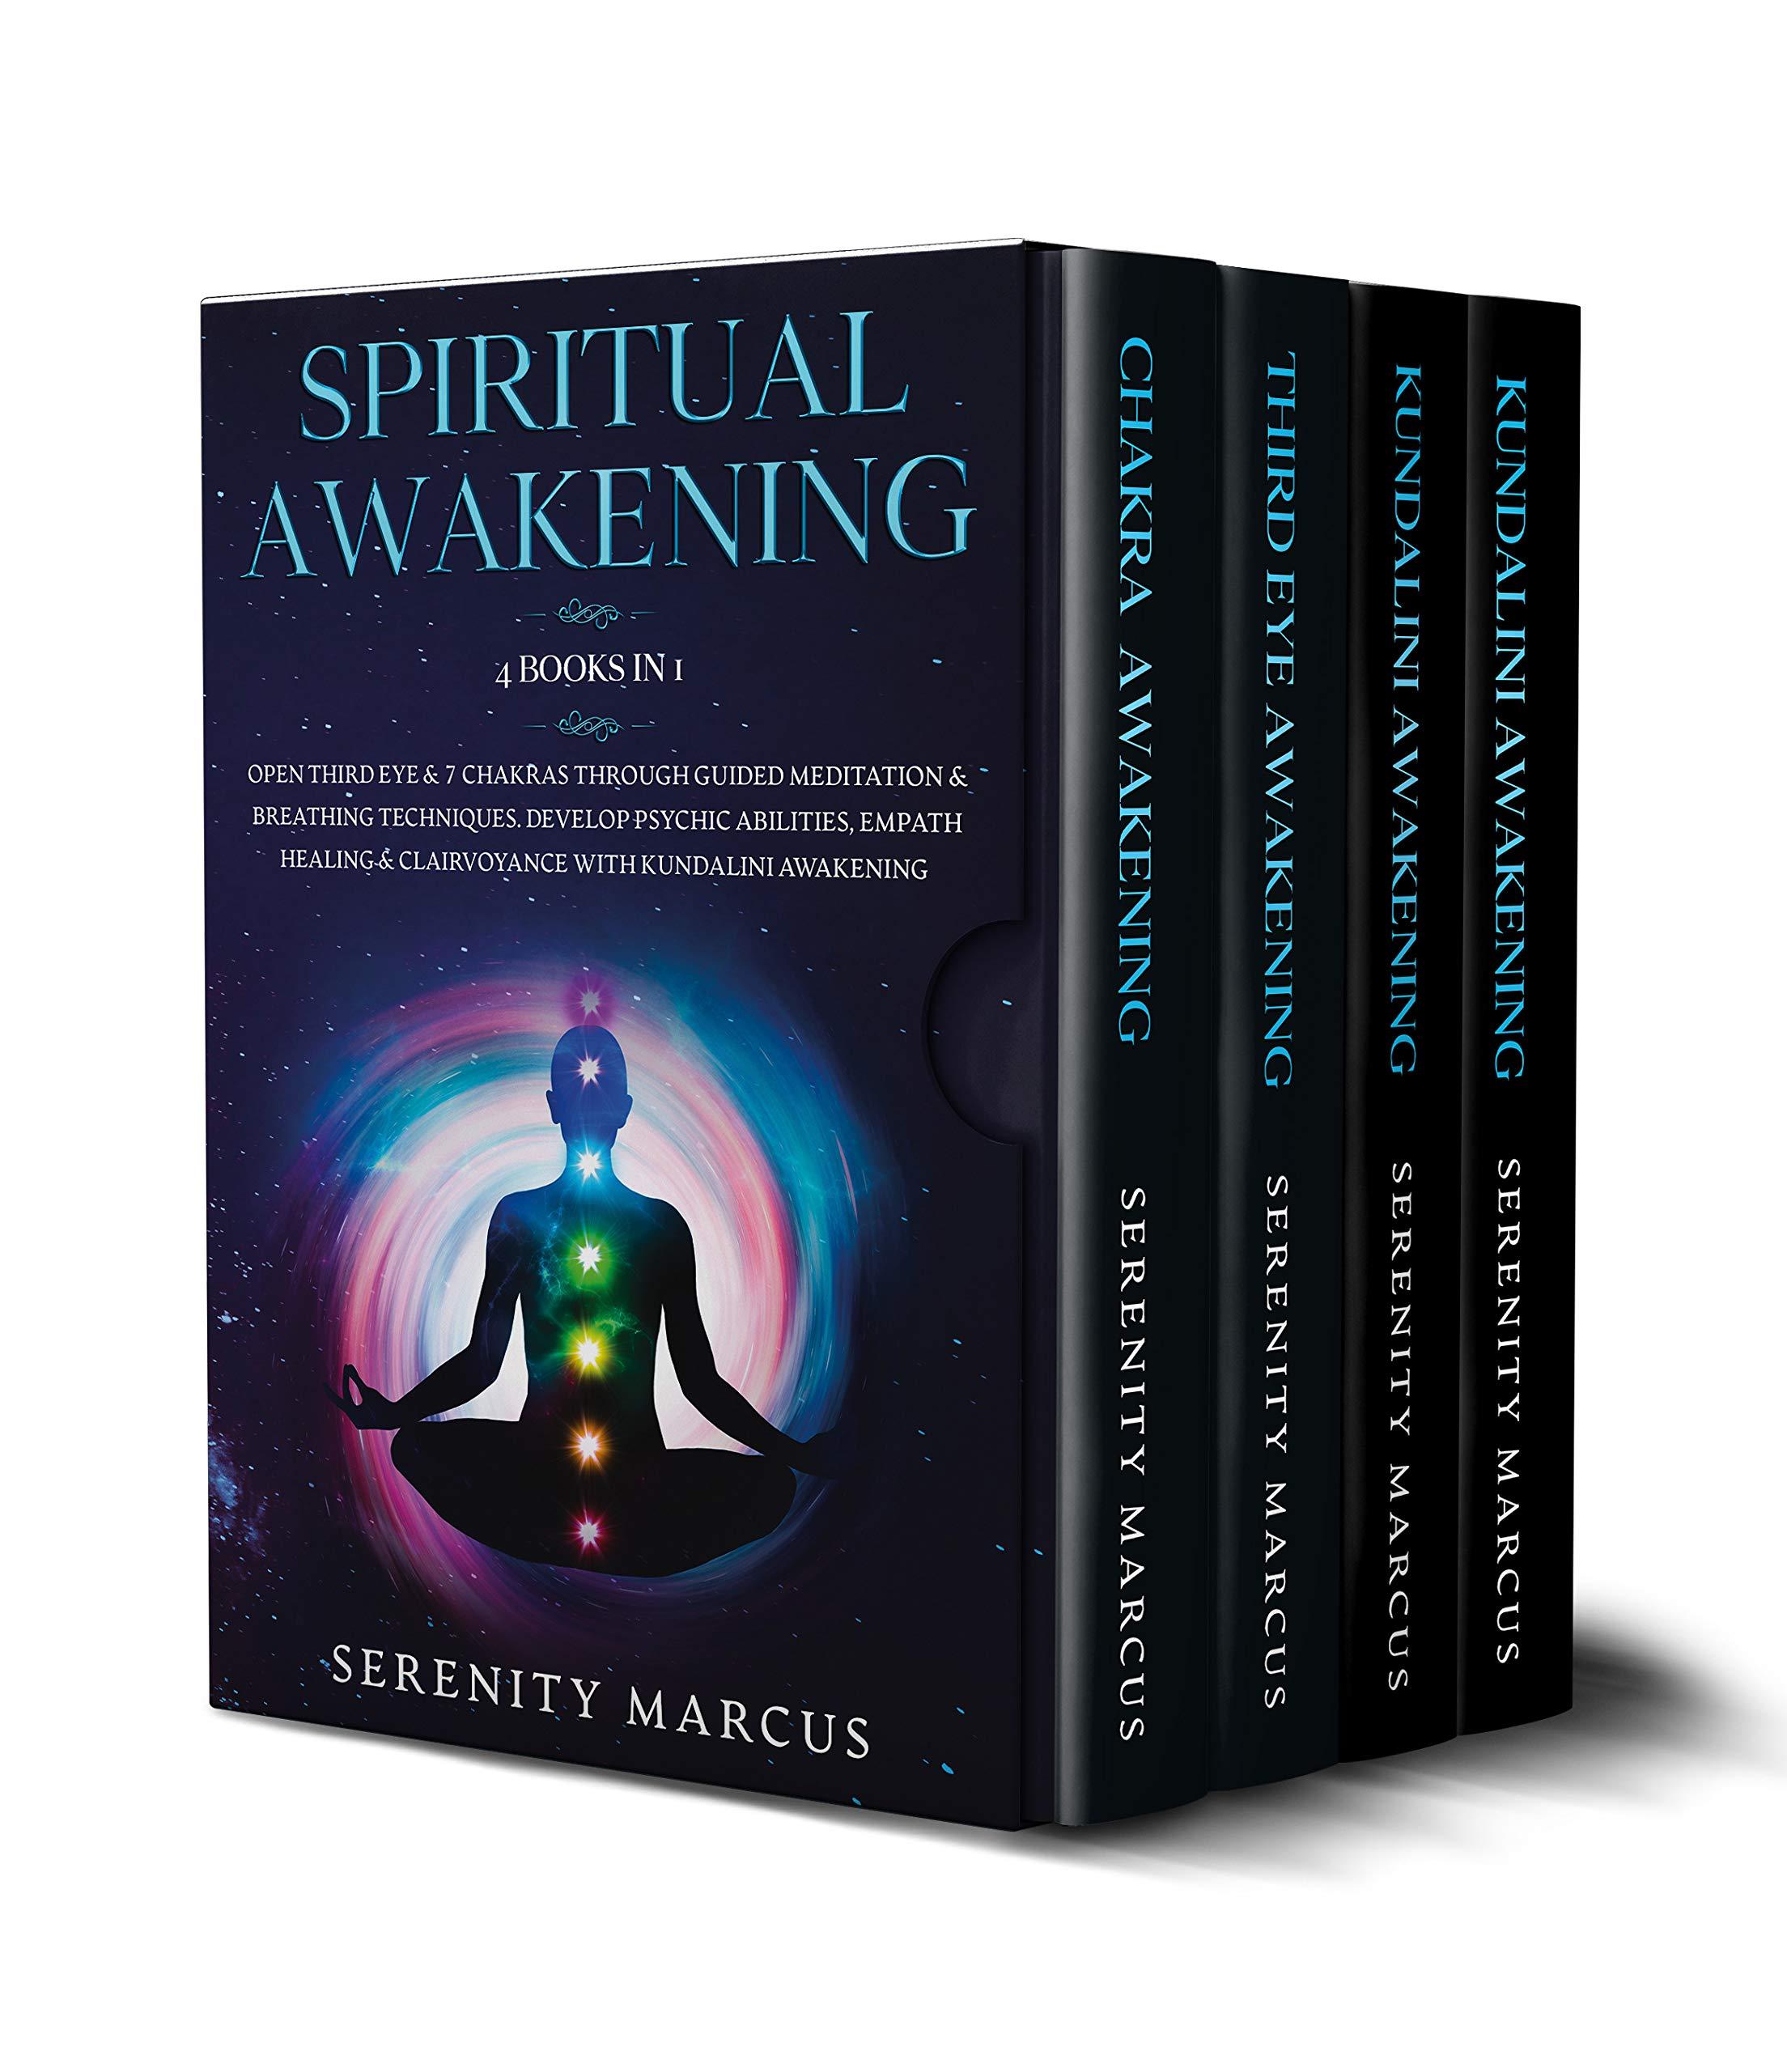 Spiritual Awakening: 4 Books in 1: Open Third Eye & 7 Chakras Through Guided Meditation & Breathing Techniques. Develop Psychic Abilities, Empath Healing & Clairvoyance with Kundalini Awakening.